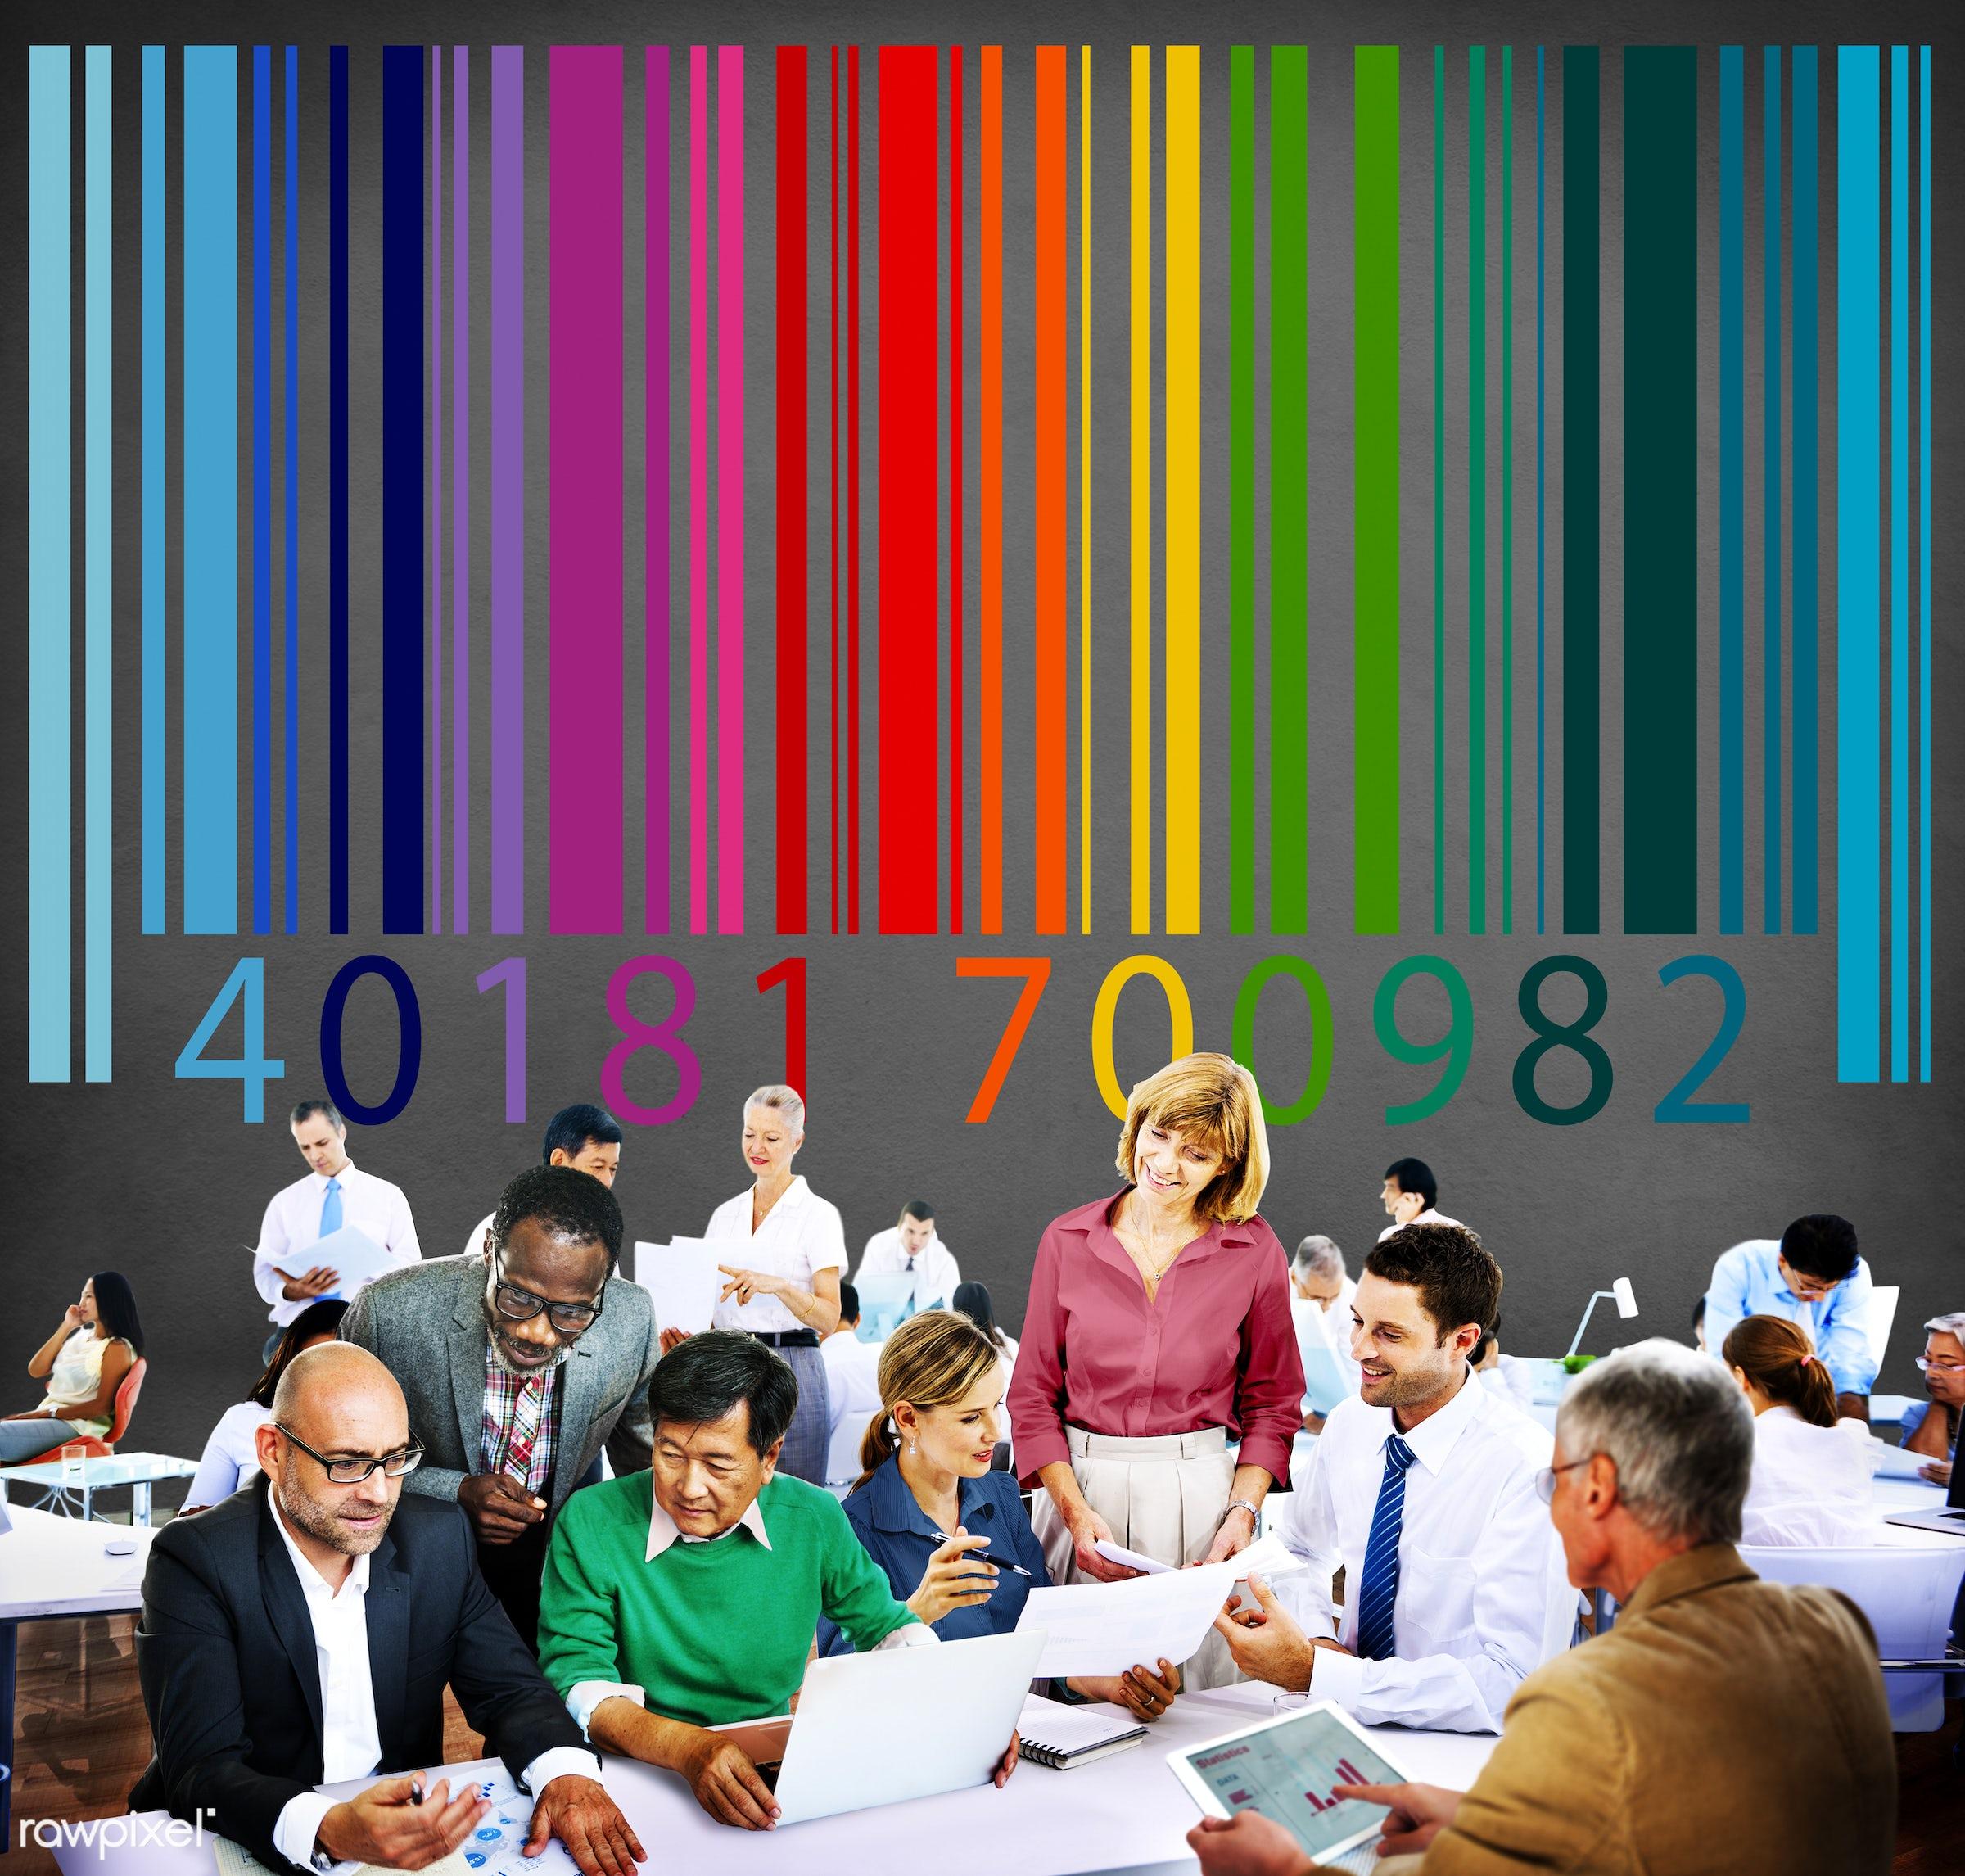 analysis, badge, bar code, bar code reader, business, business people, businessmen, businesswomen, busy, buy, coding,...